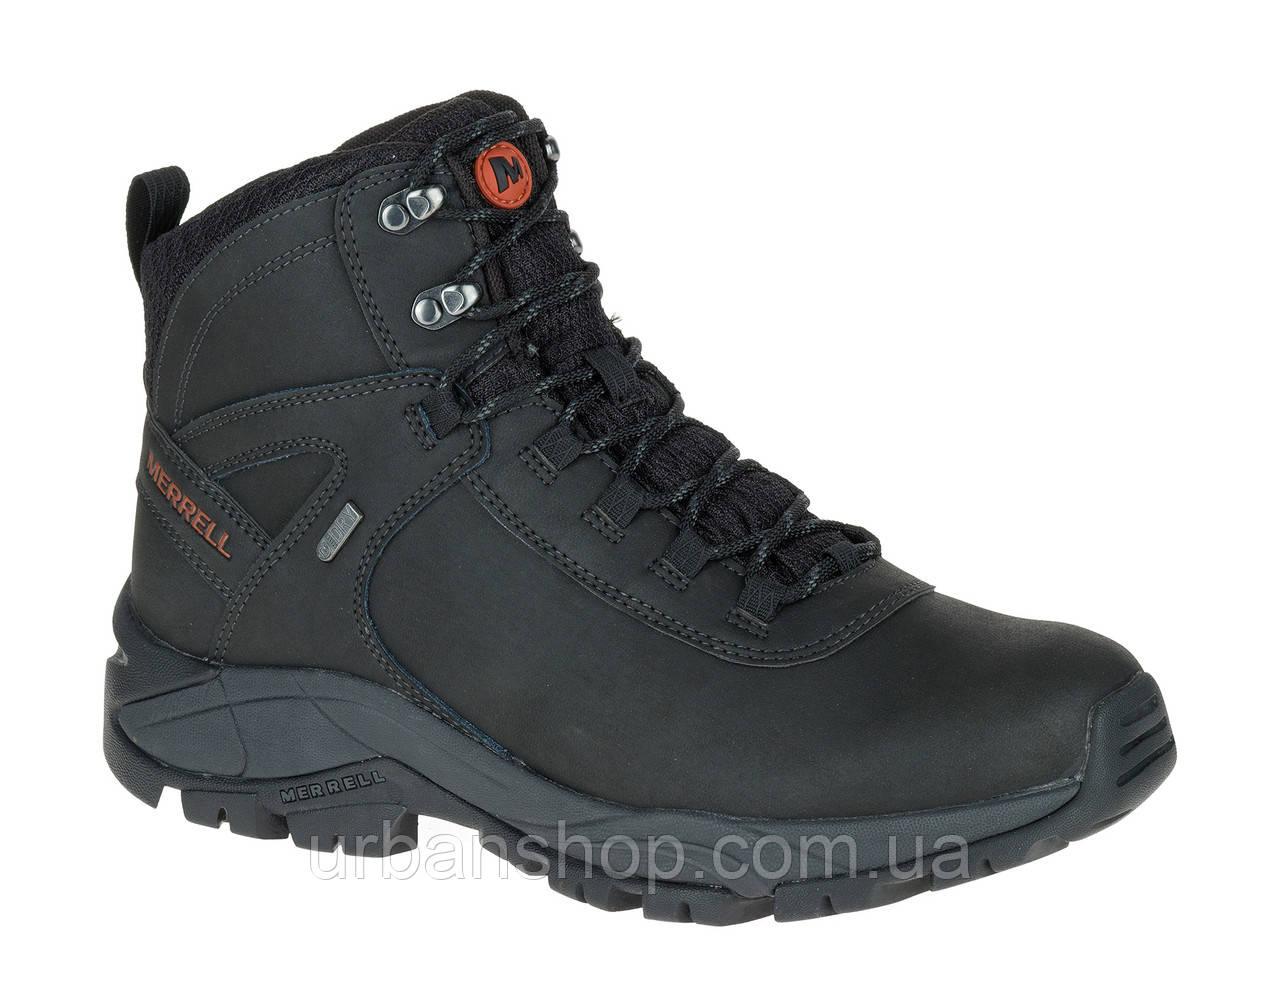 45.5 2  Черевики ботинки Merrell Vego Mid Leather Waterproof WP J311538C. ebfc89085faab